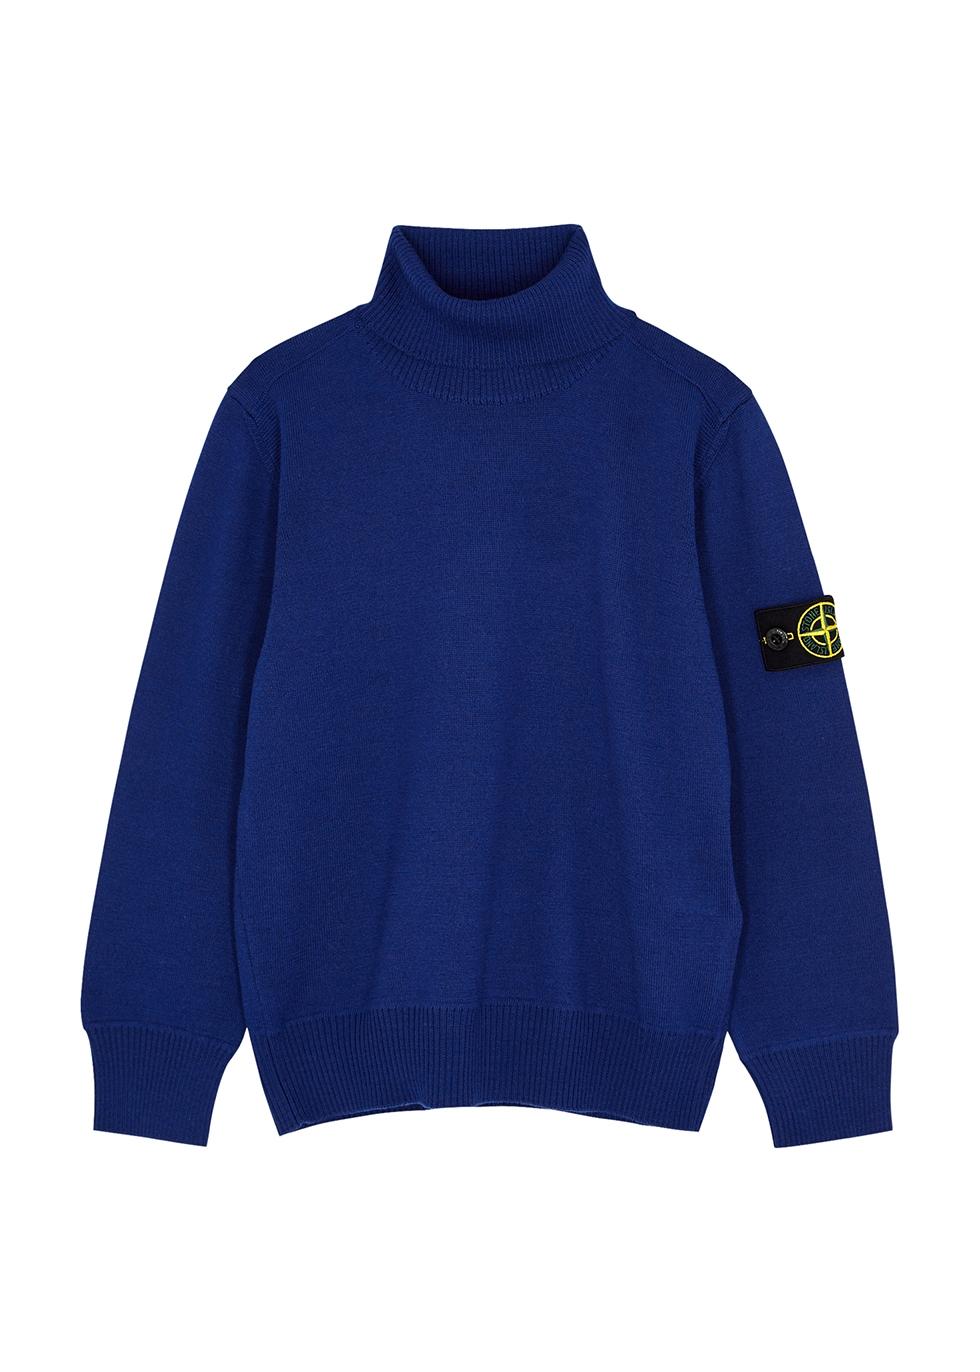 Blue roll-neck wool jumper (6-8 years)